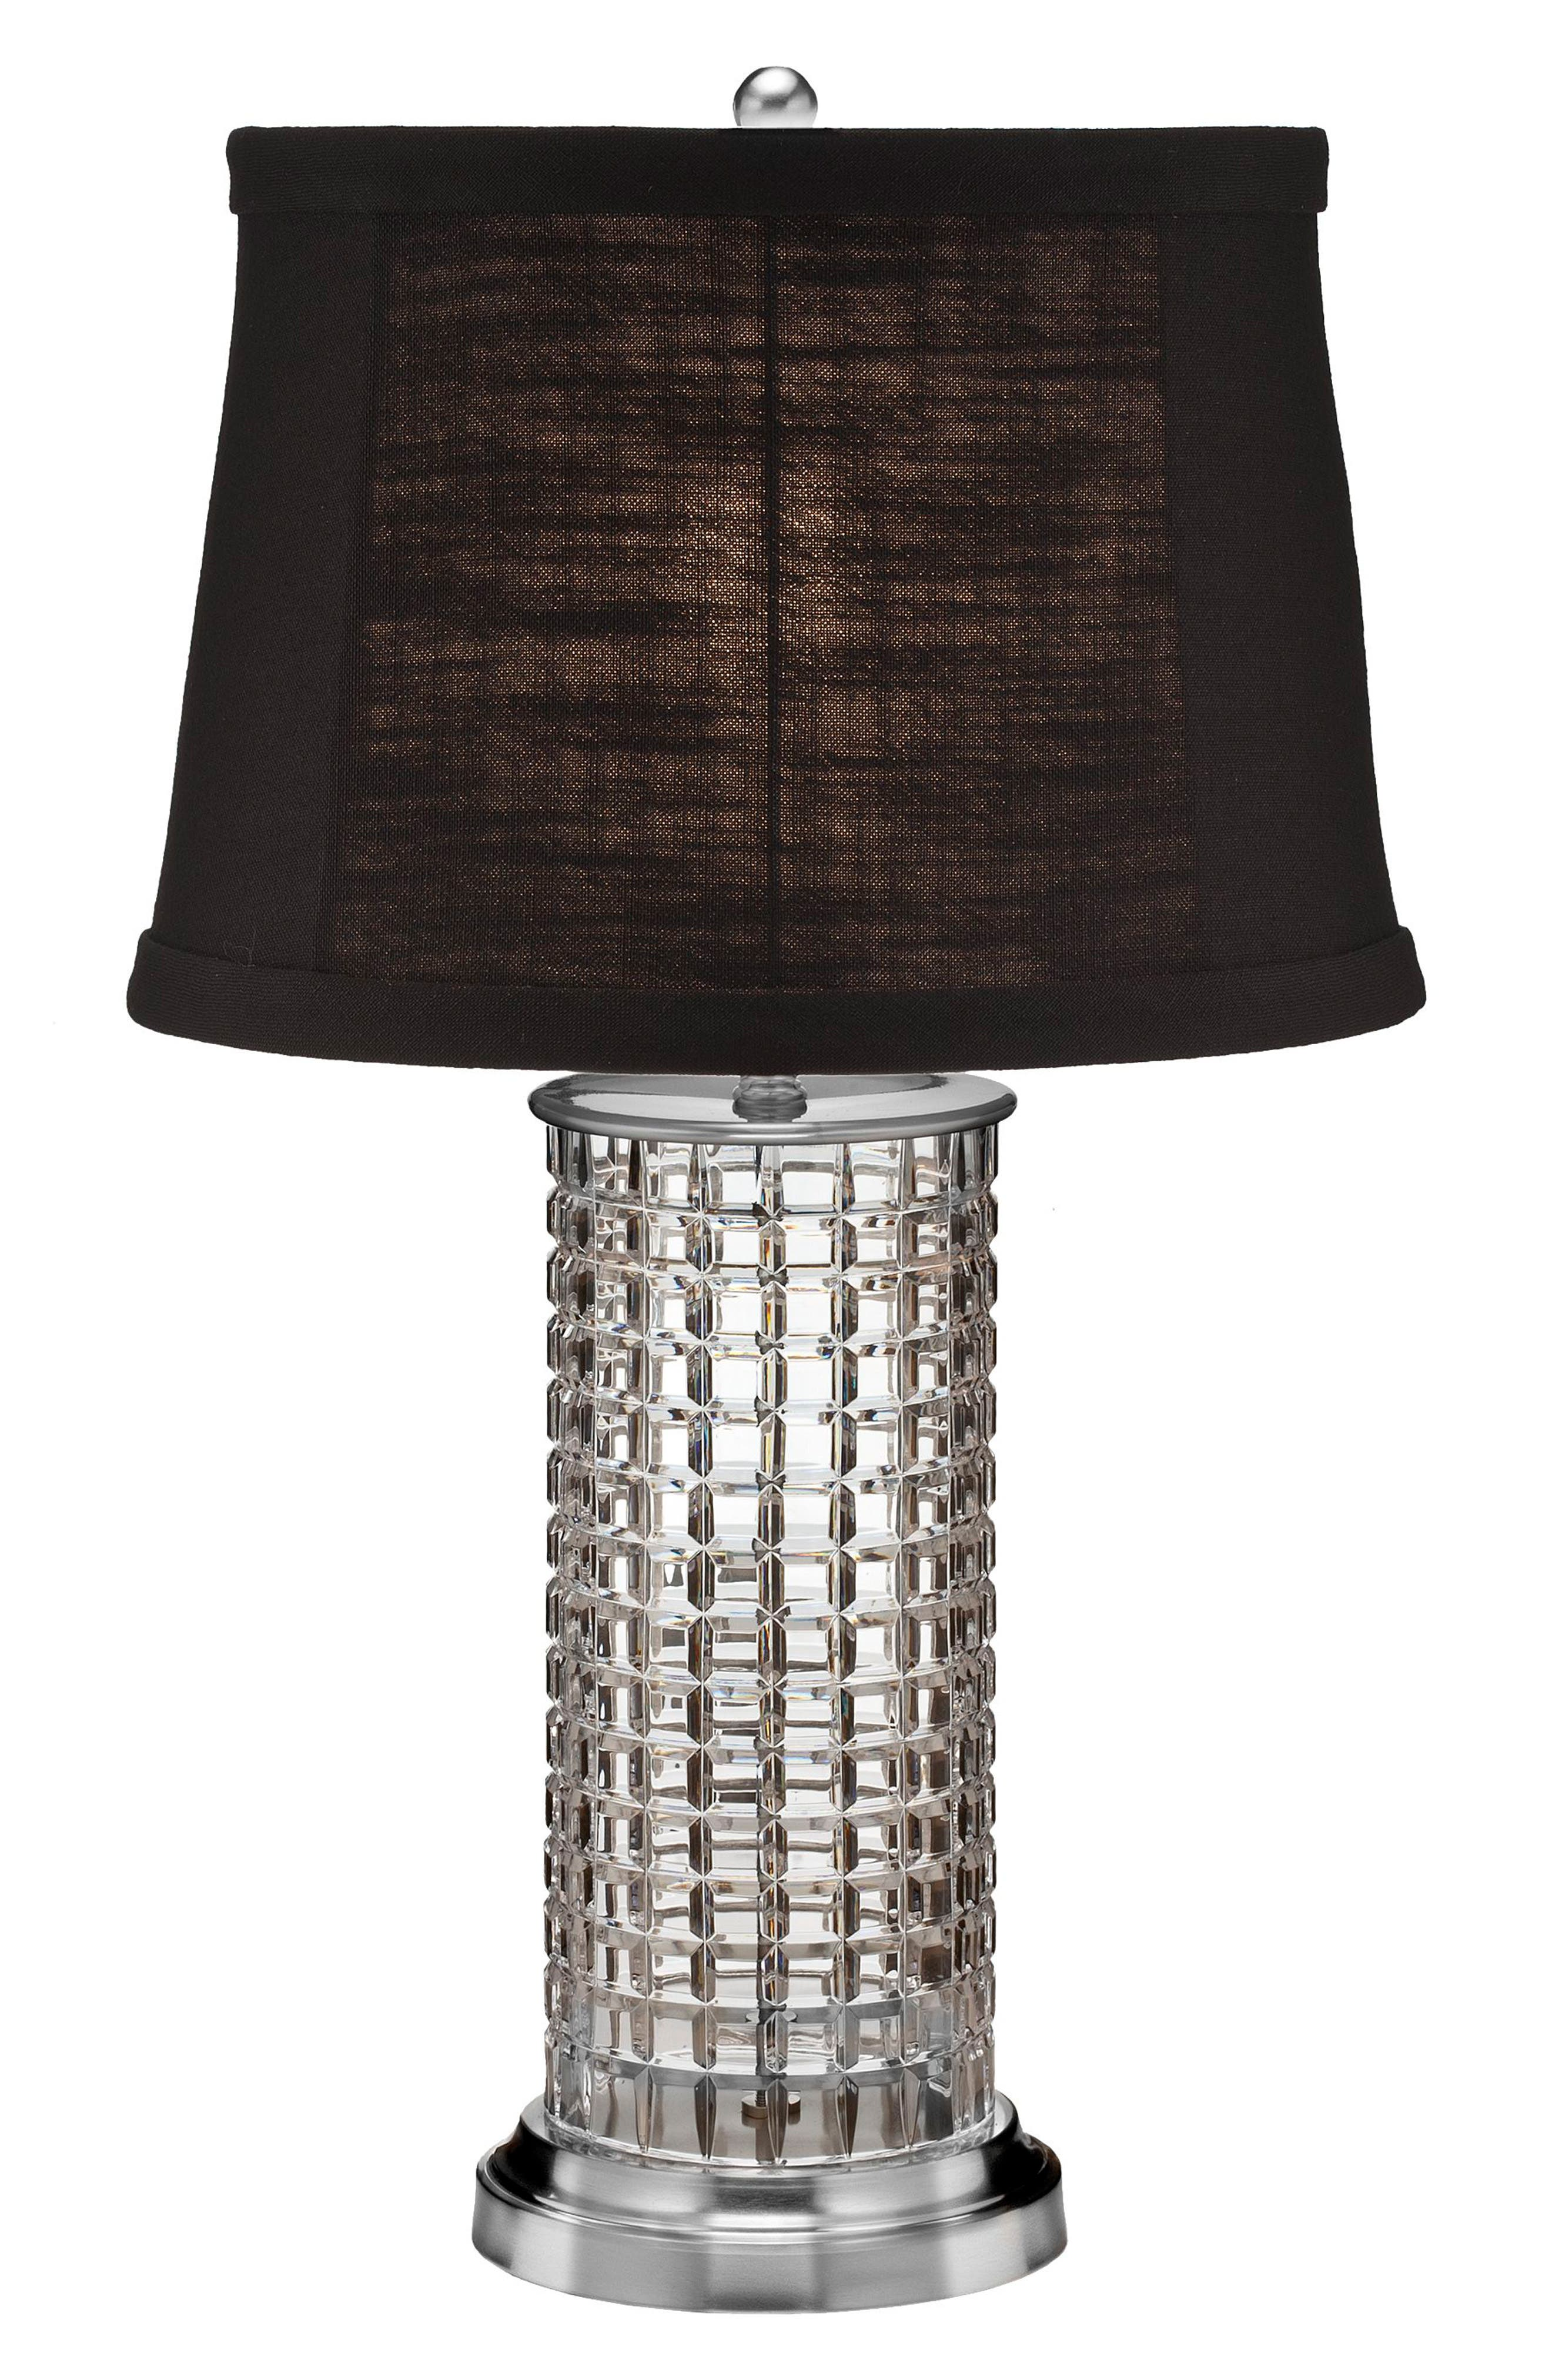 Kilrush Lead Crystal & Chrome Table Lamp,                             Main thumbnail 1, color,                             100